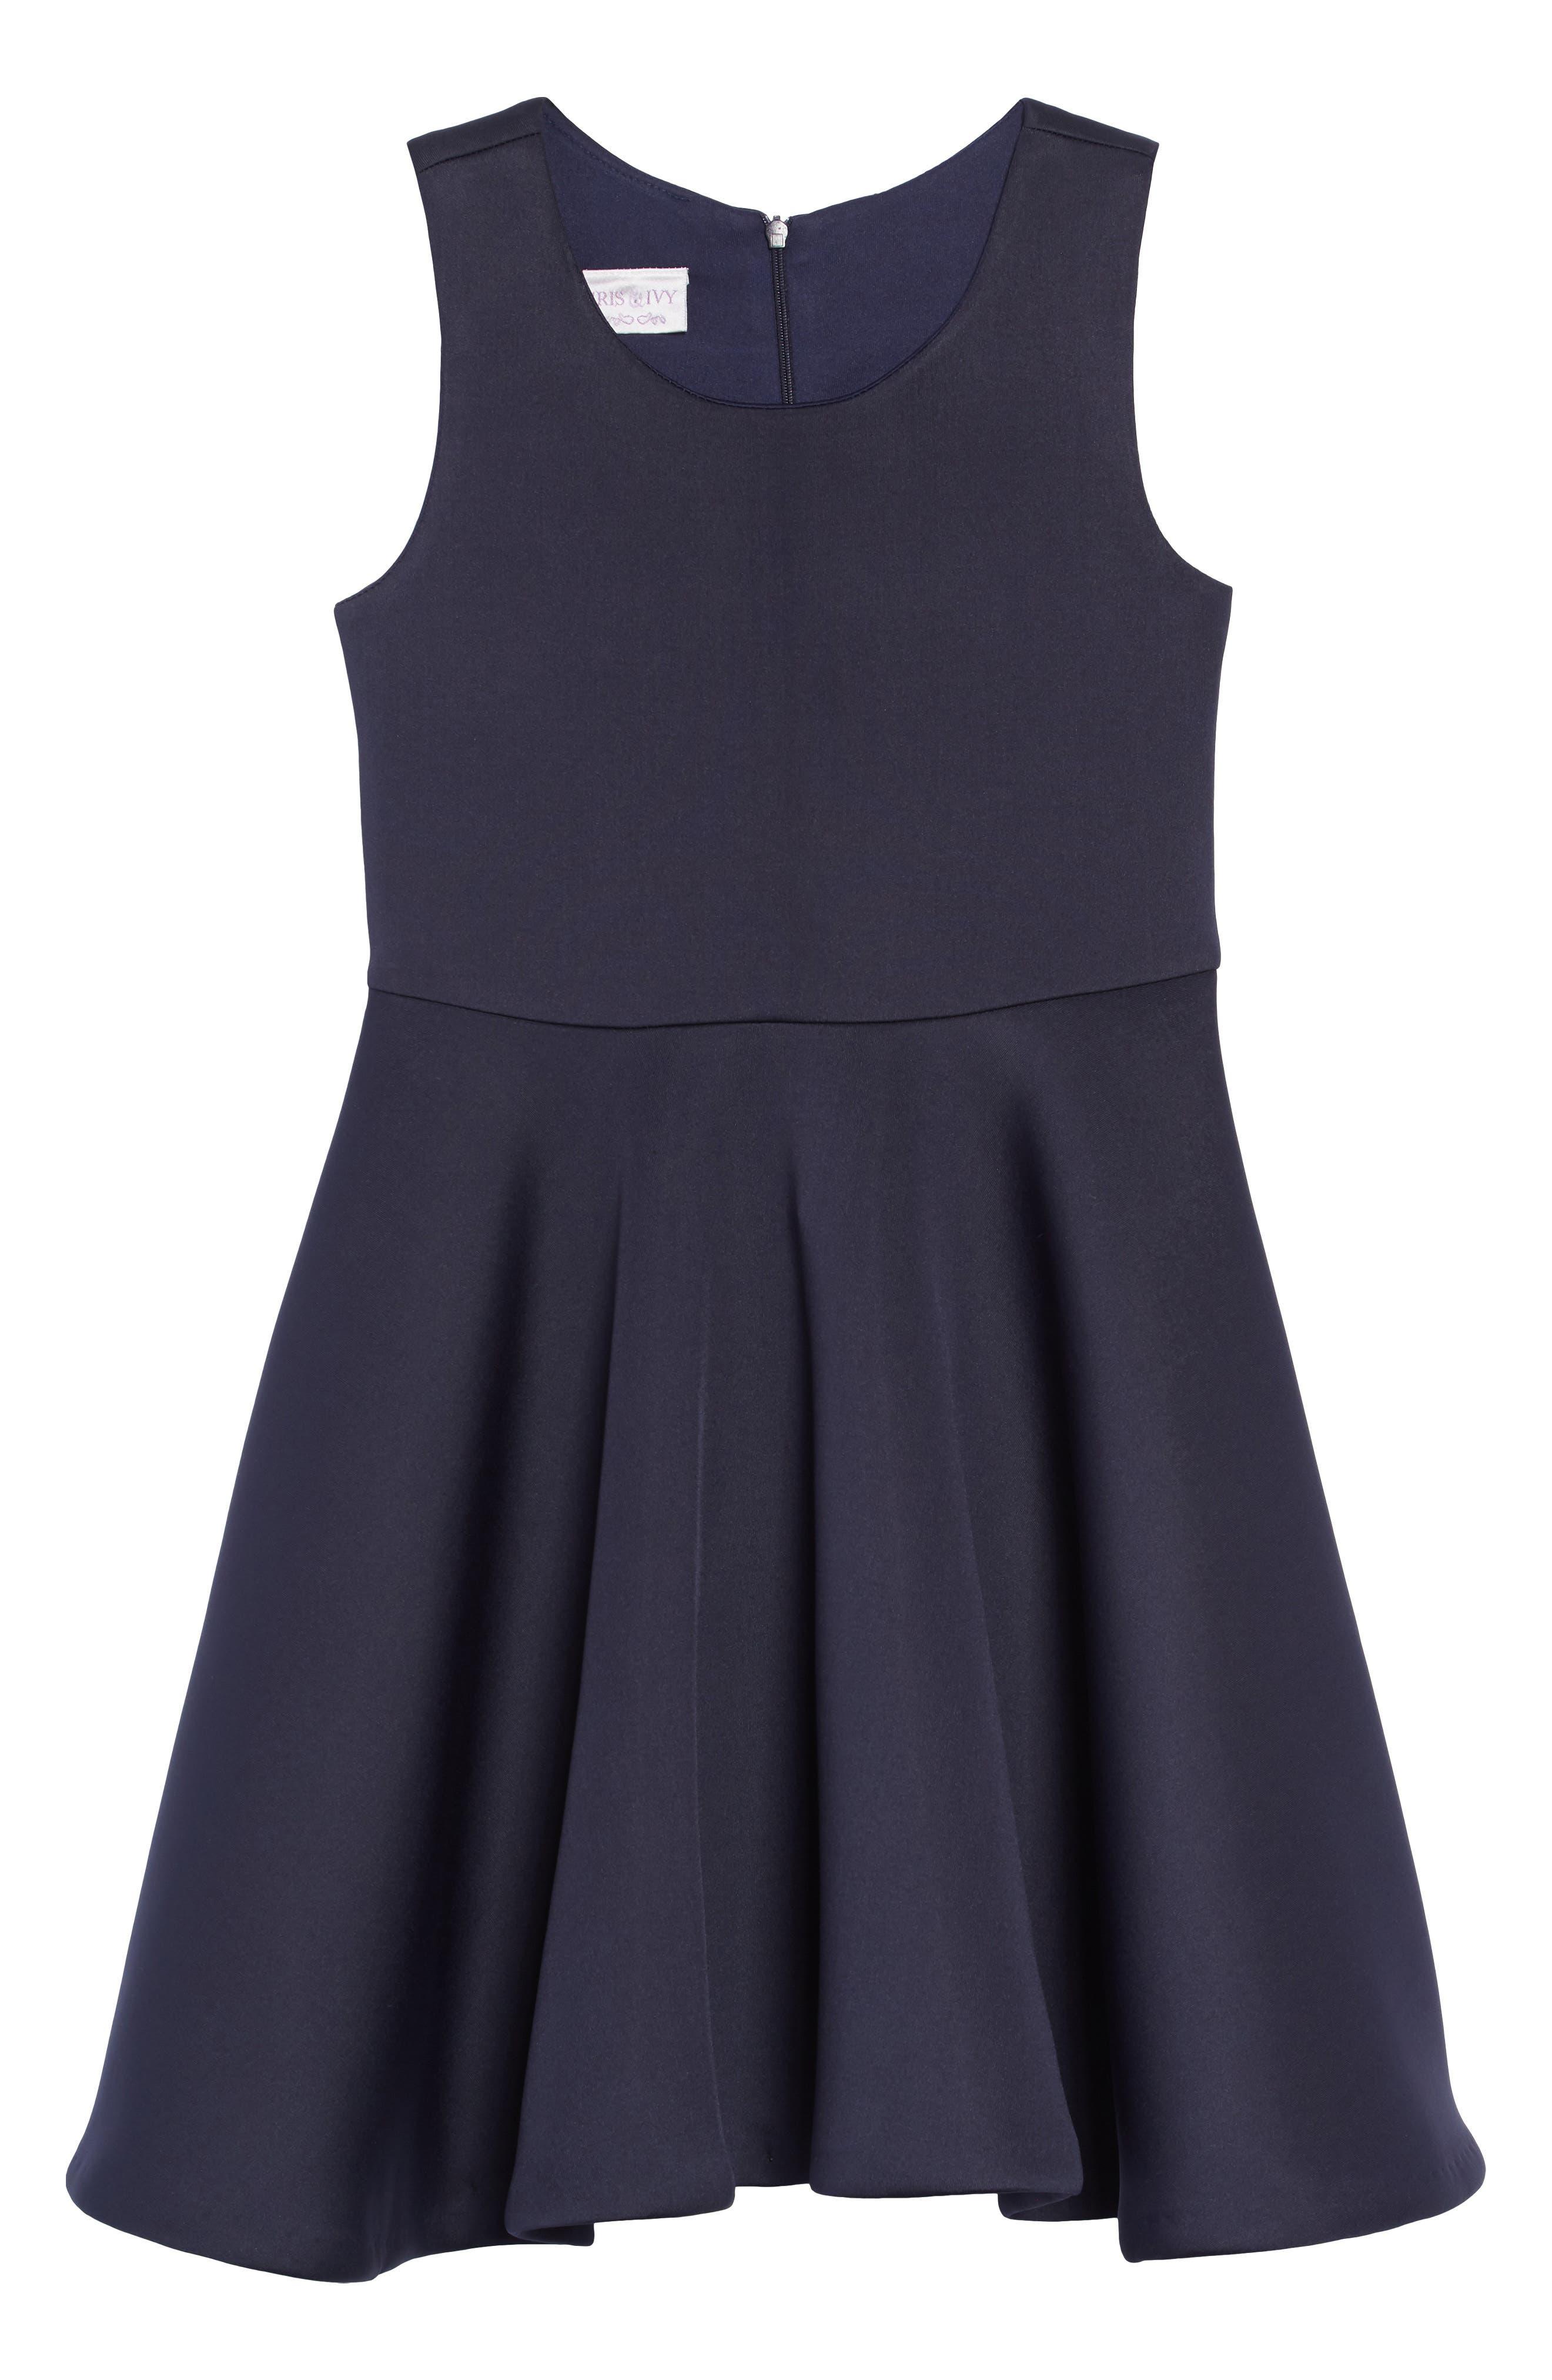 Scuba Tank Dress,                             Main thumbnail 1, color,                             NAVY